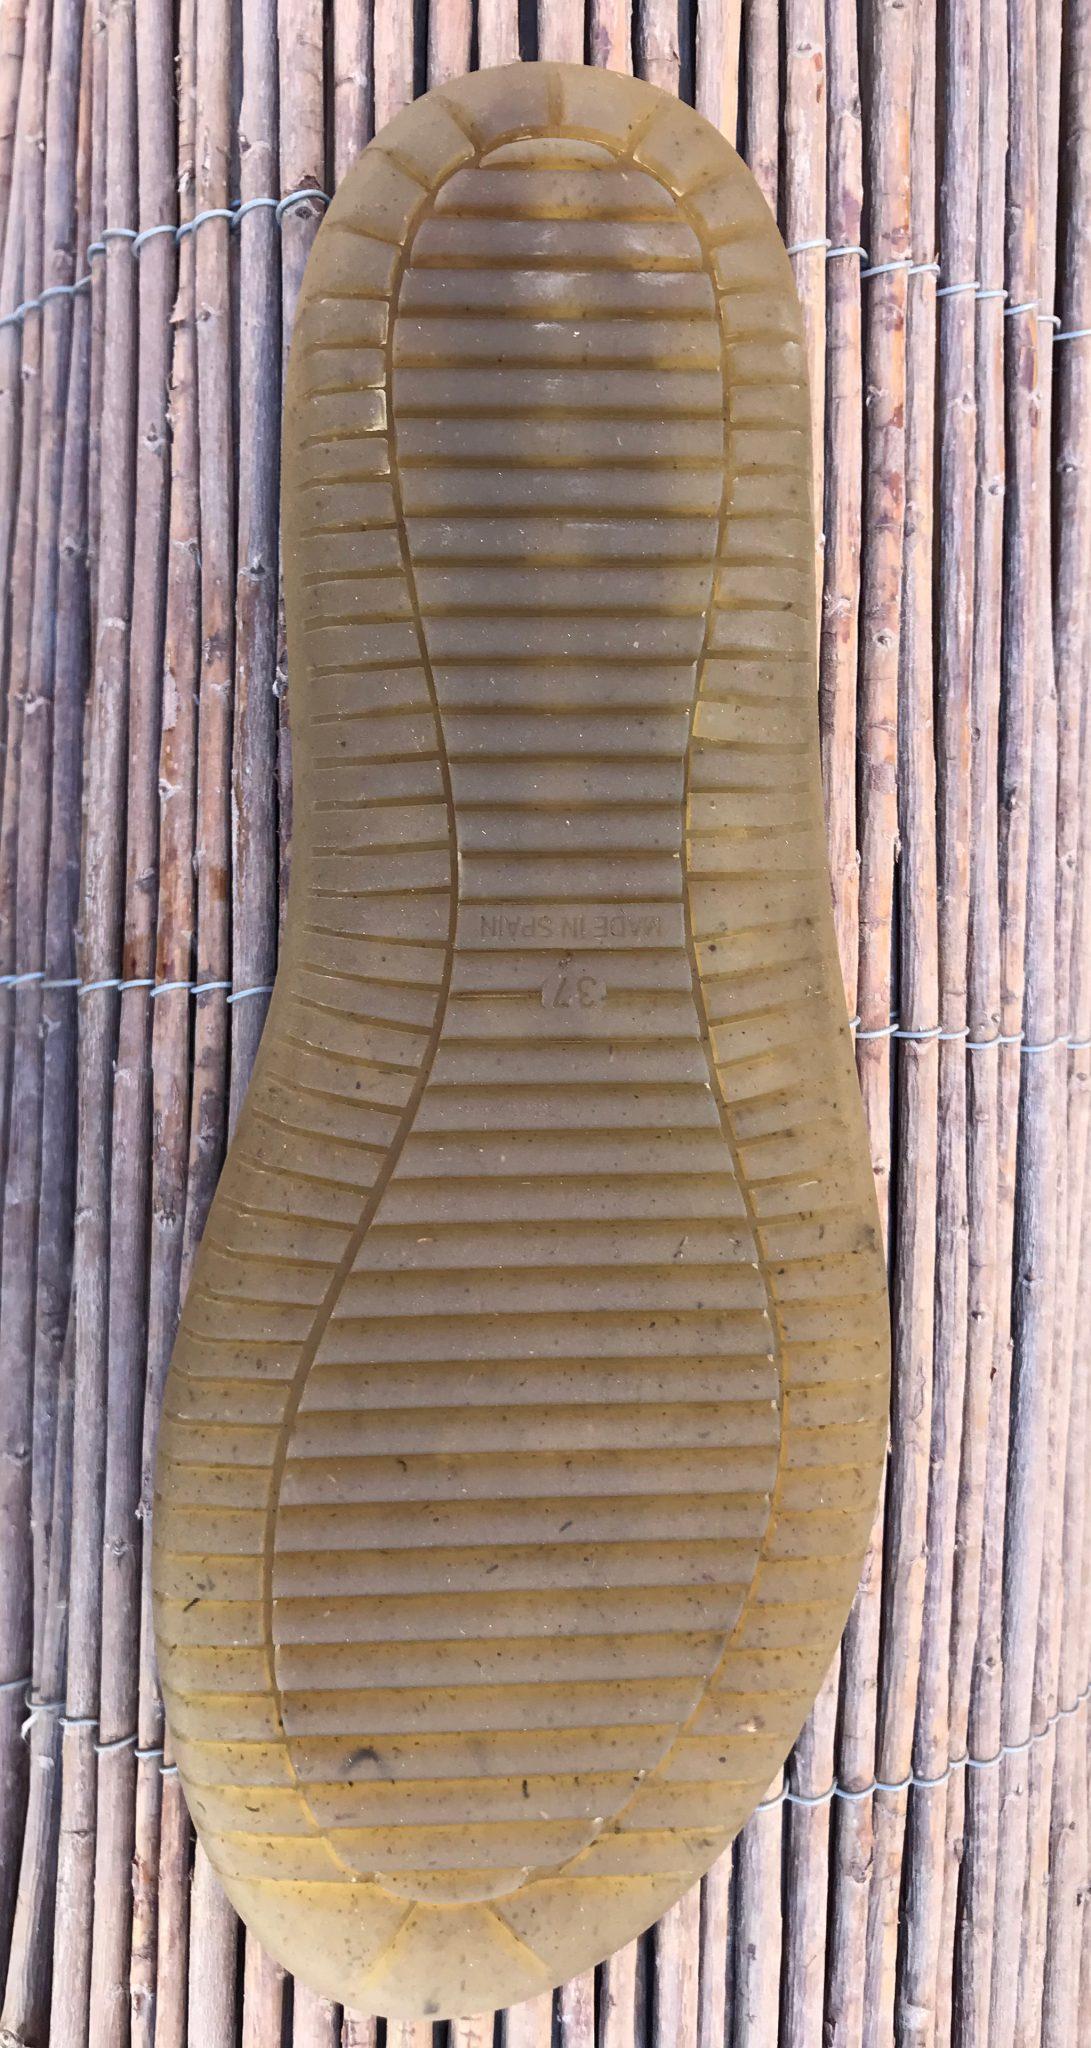 """Bio-recycled"" made with TPU main material and ""fibras vegetales provinientes de hierba y cañamo"" (grass fiber and hemp fibers)"